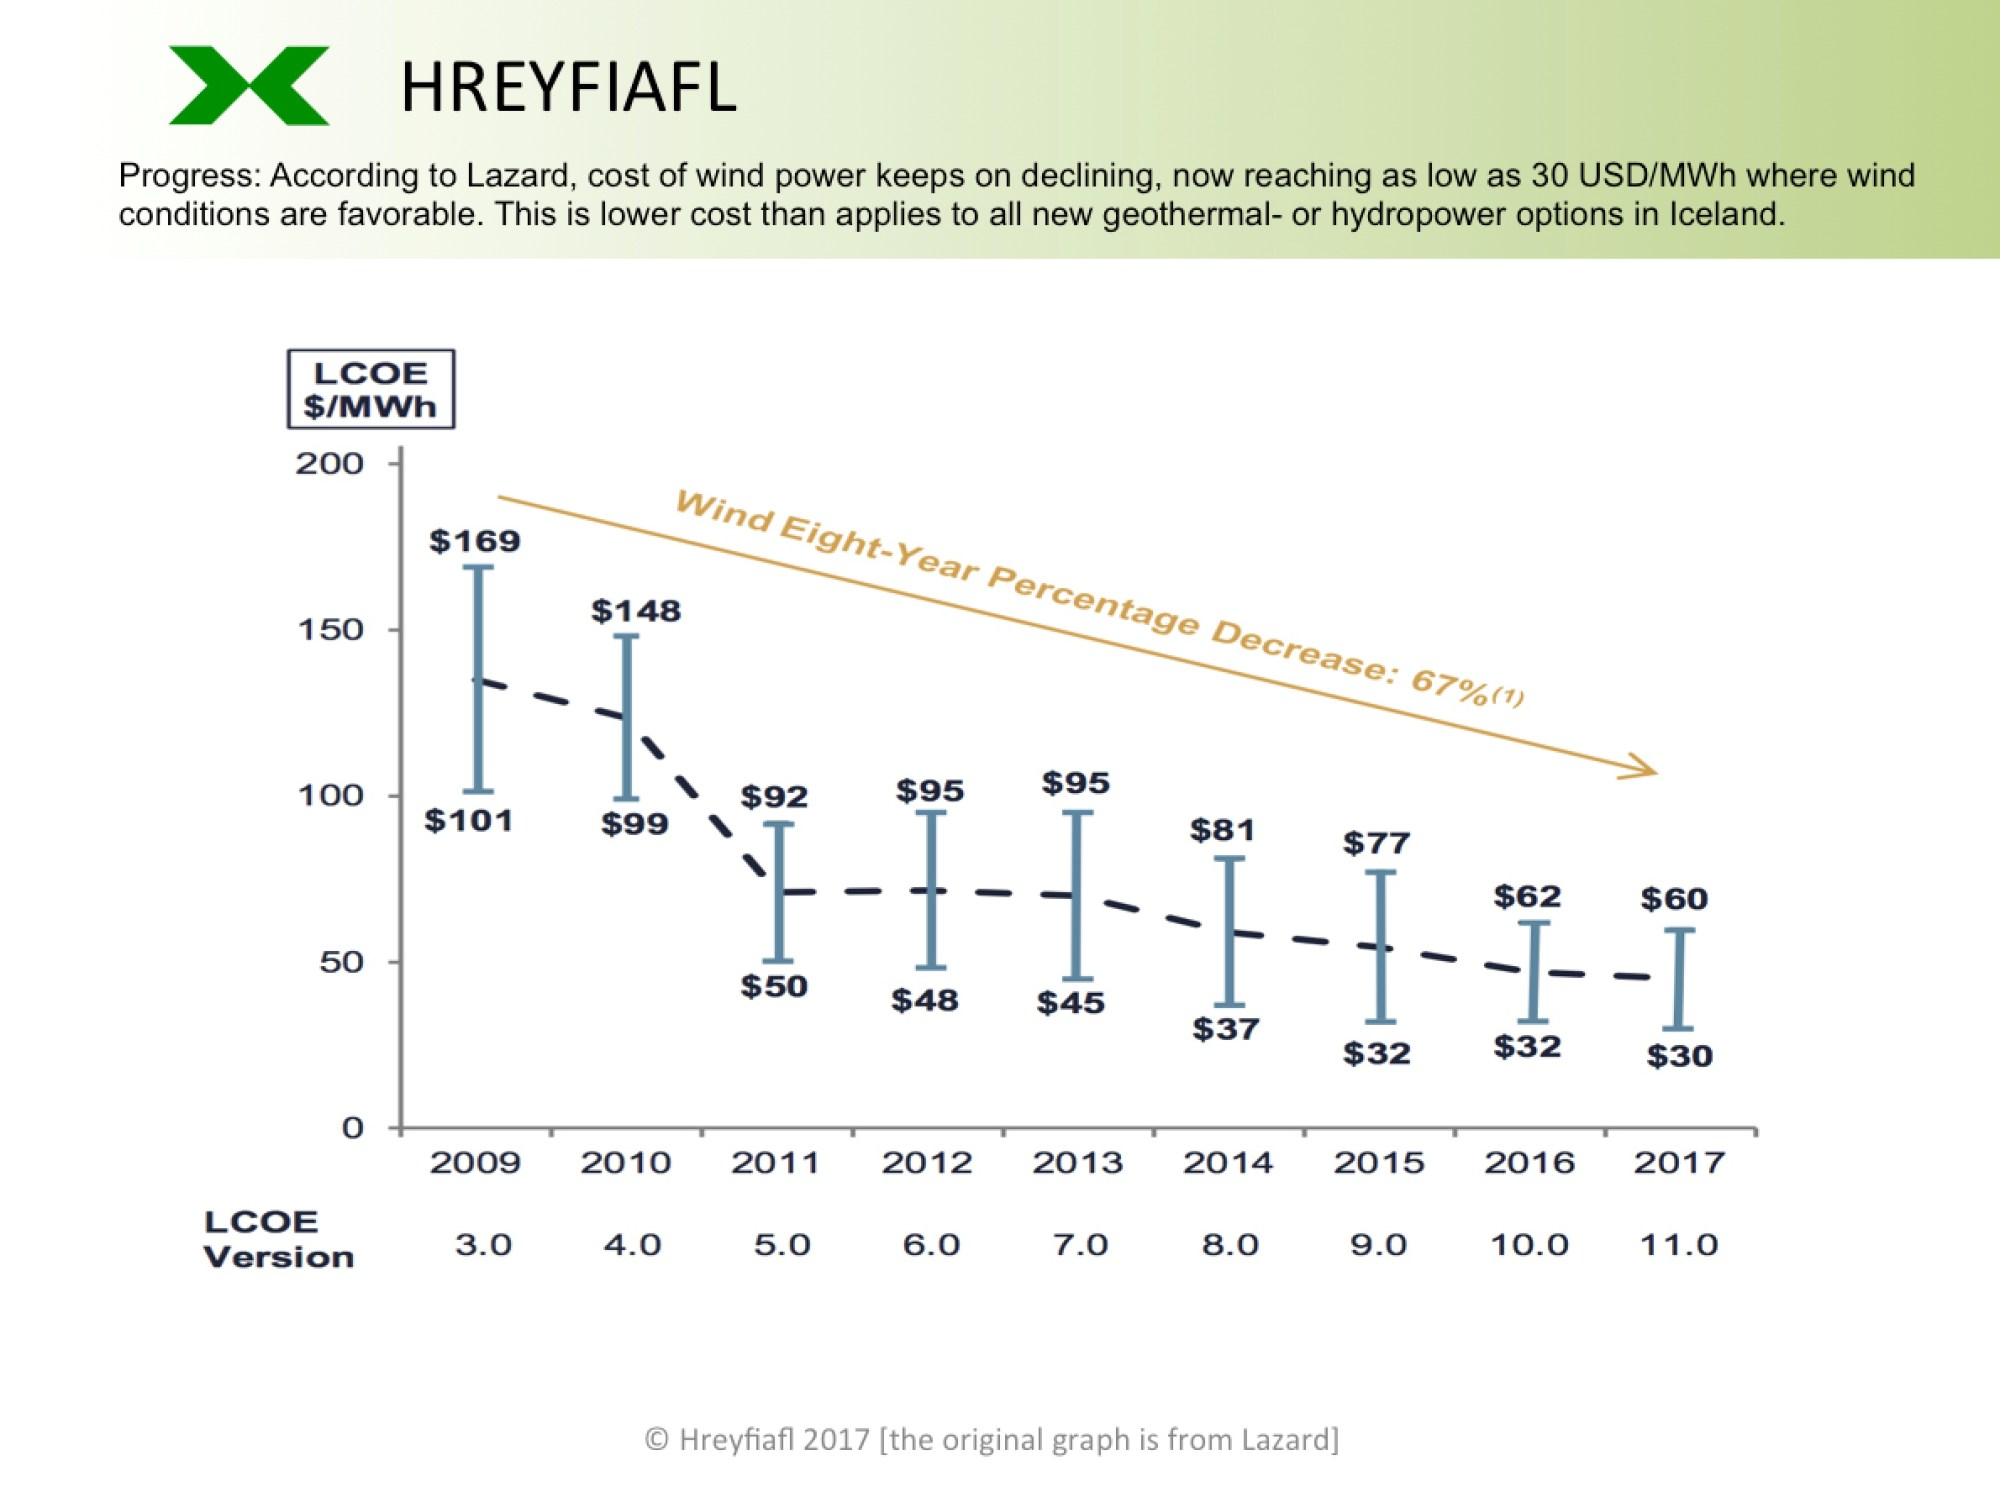 hight resolution of hreyfiafl wind power cost development 2009 2017 lazard lcoe version